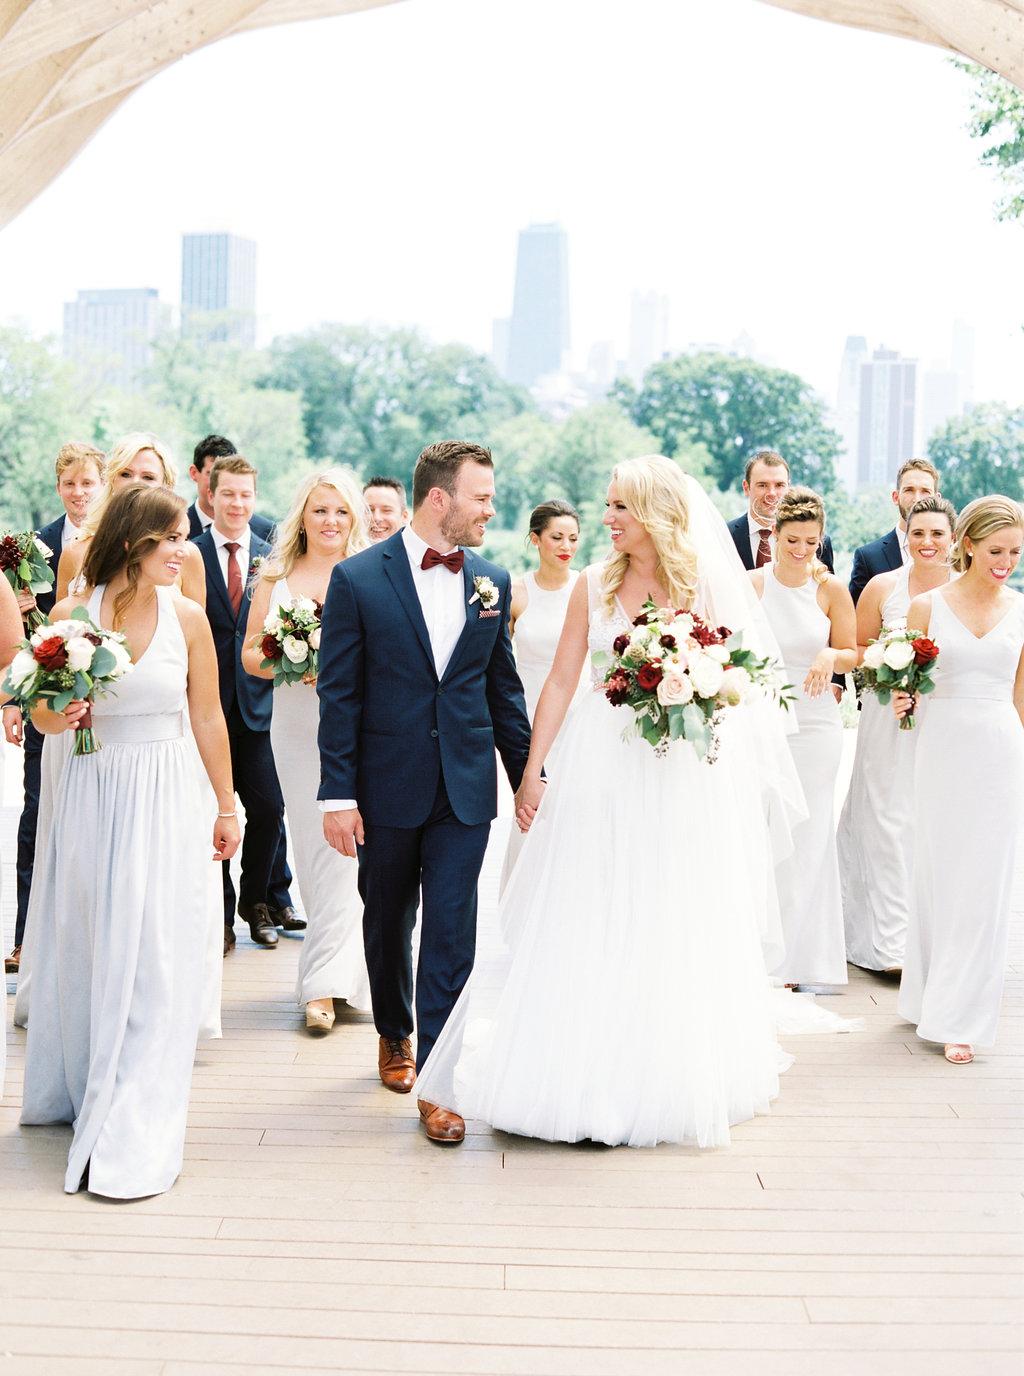 nicoleclarey_stacey+alexwedding_weddingparty-36.jpg